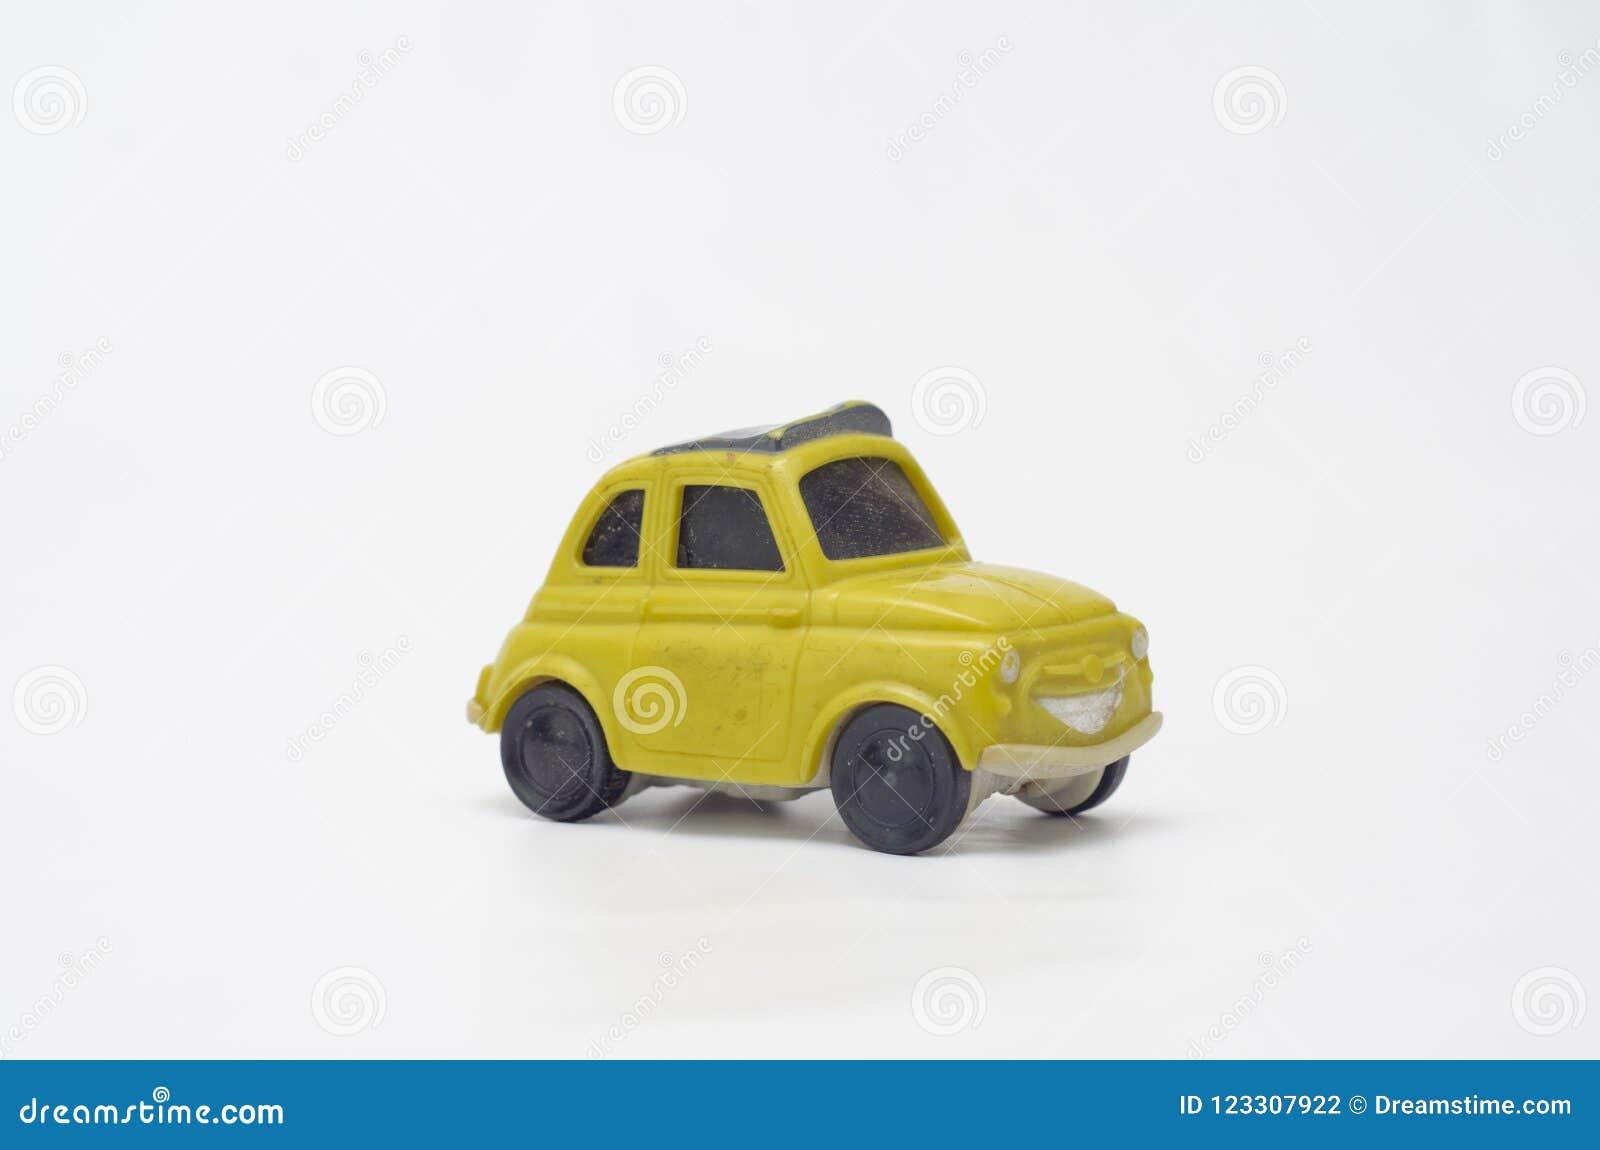 Altes und lustiges gelbes Plastikauto